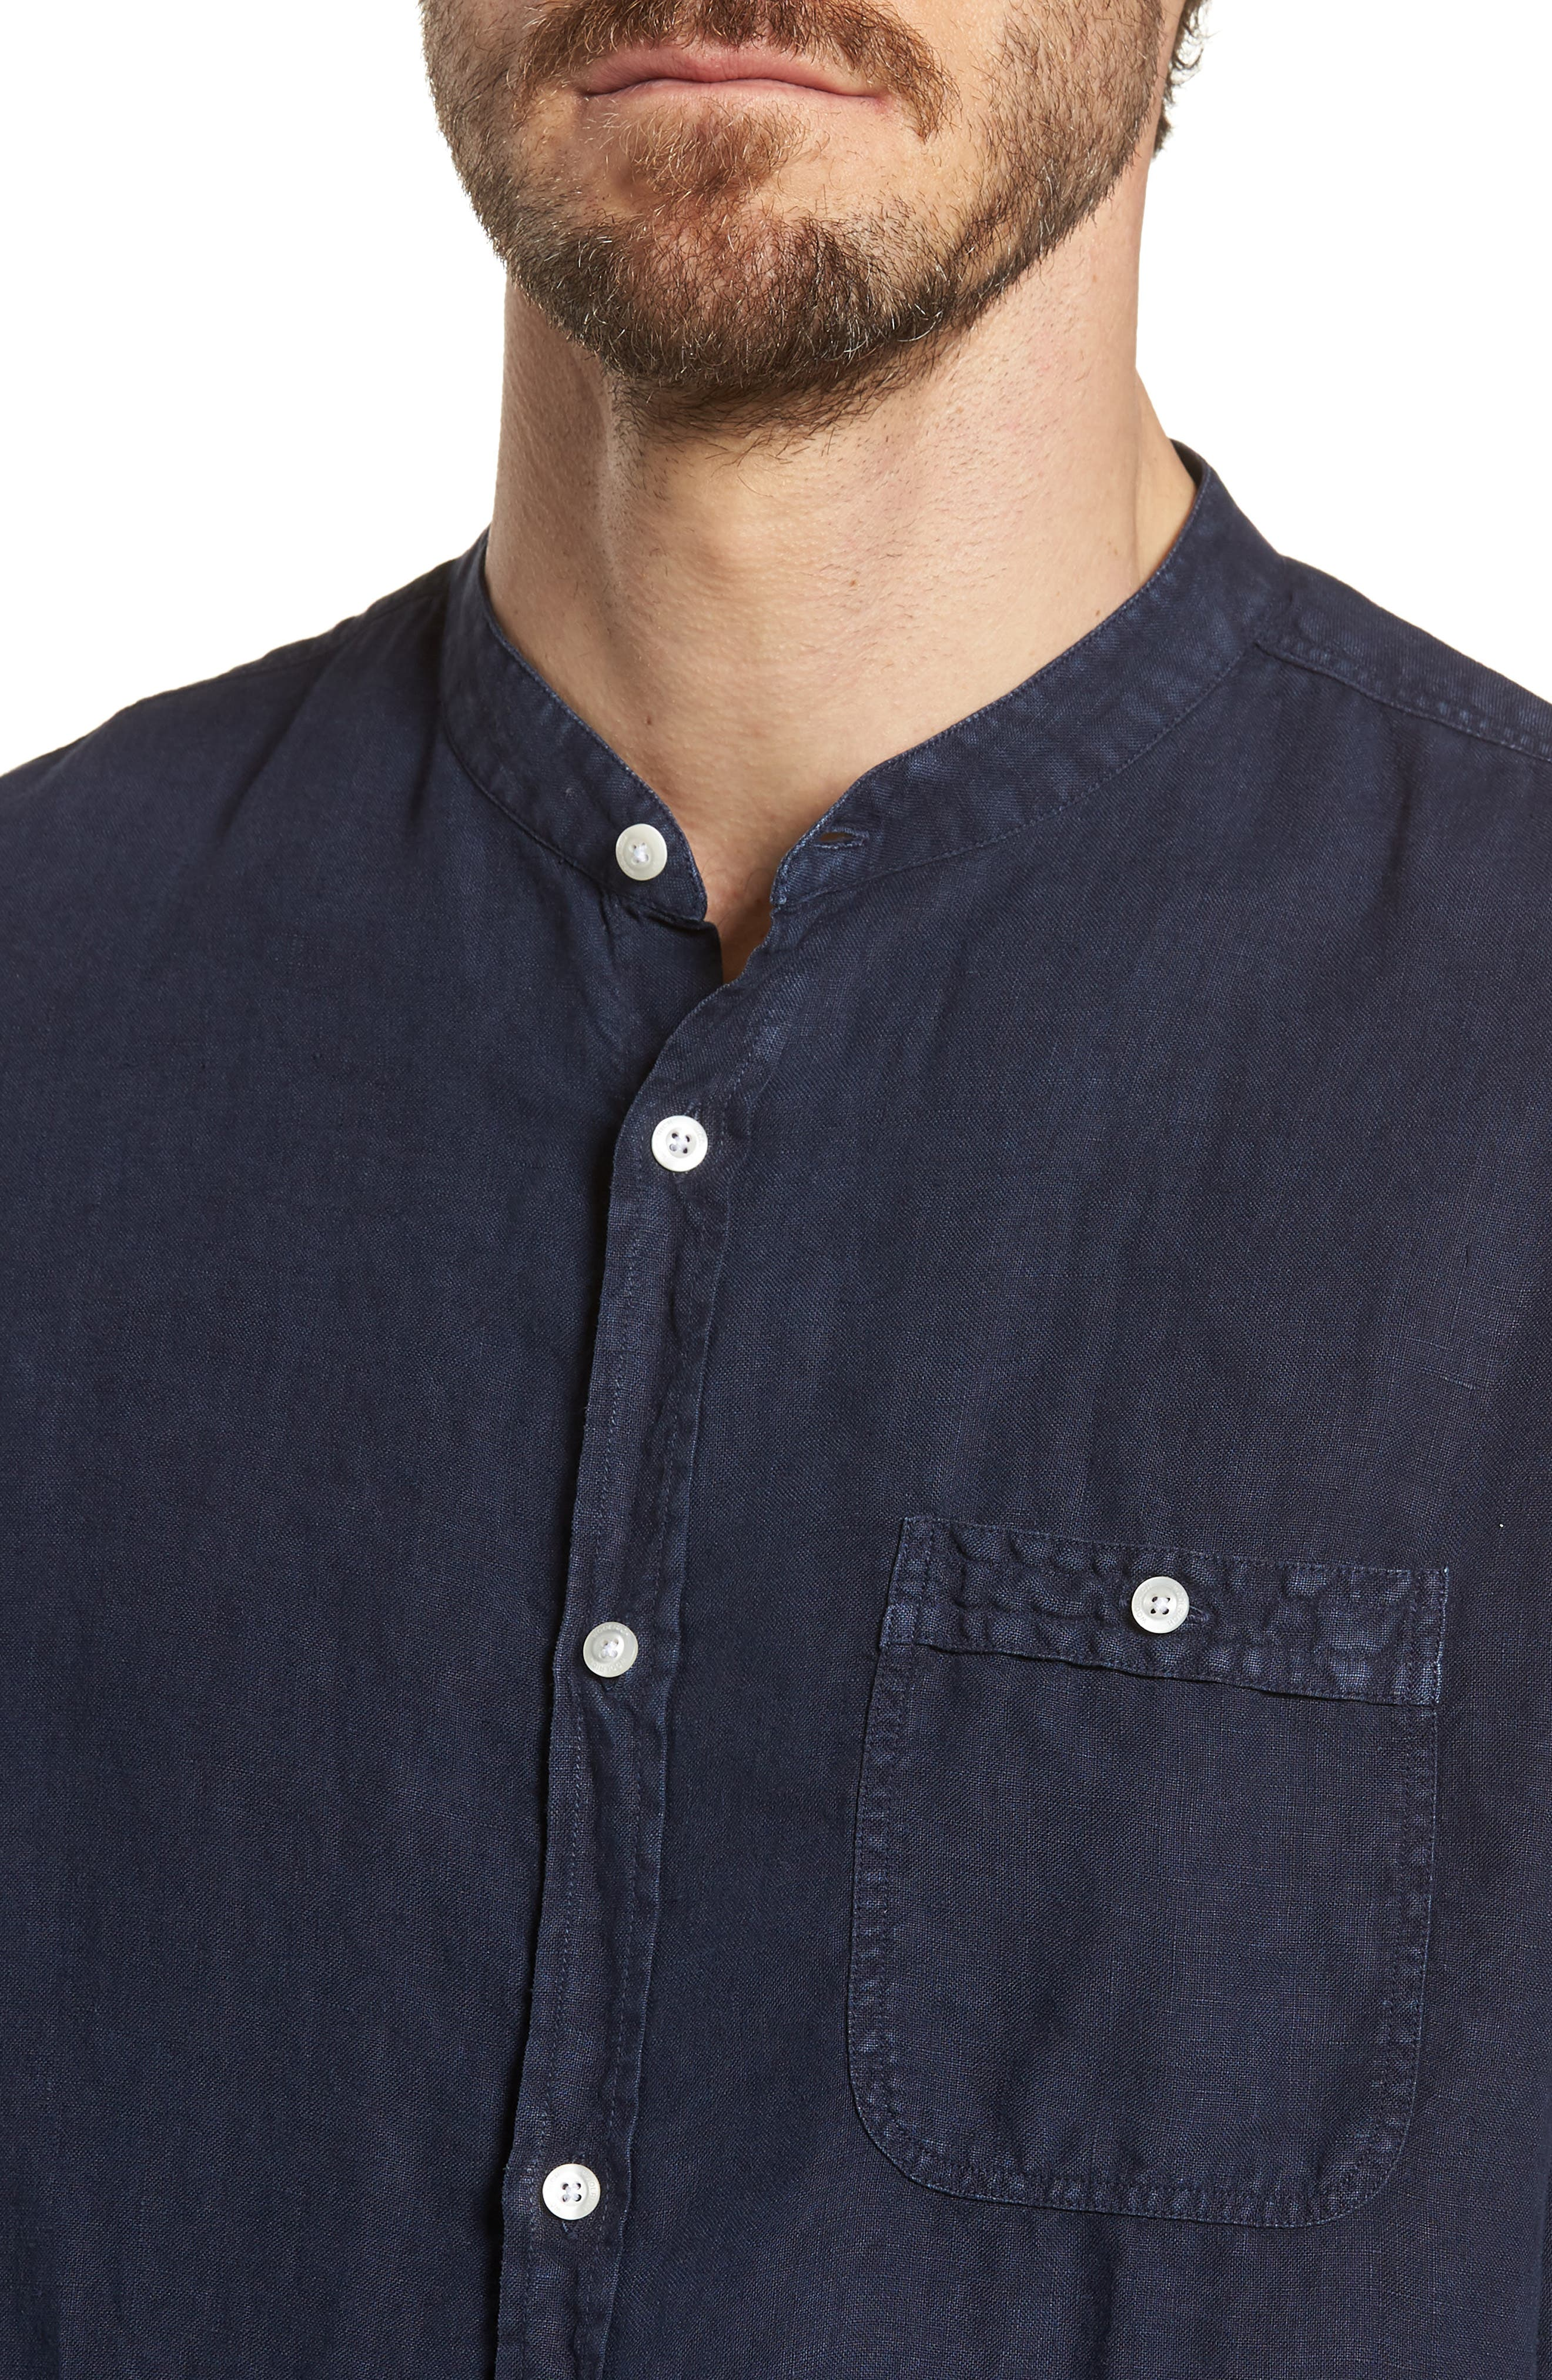 & Bros. Regular Fit Band Collar Linen Shirt,                             Alternate thumbnail 4, color,                             Mood Indigo